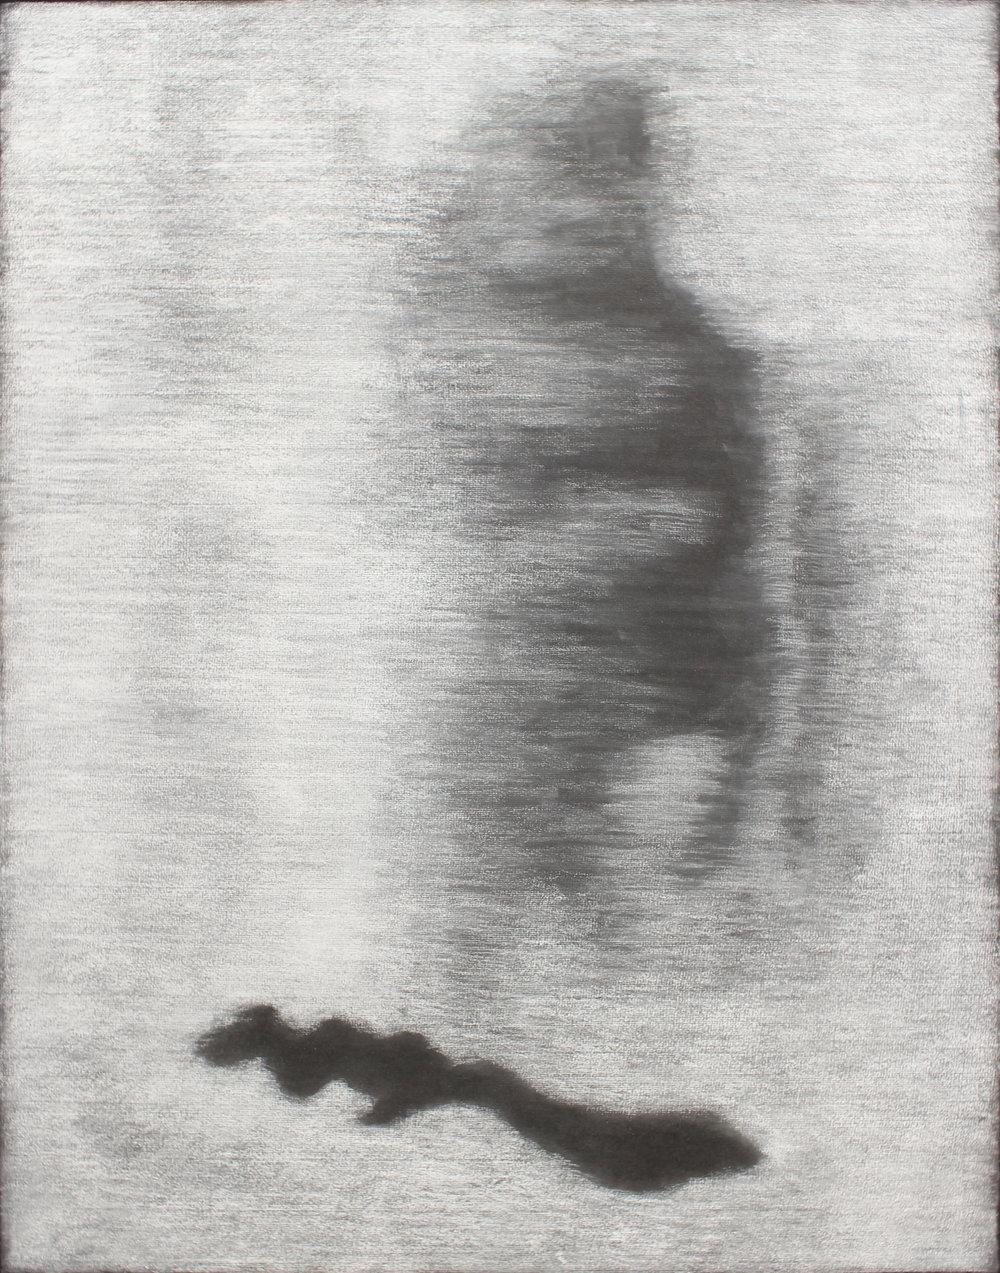 The Black Shadow - Study